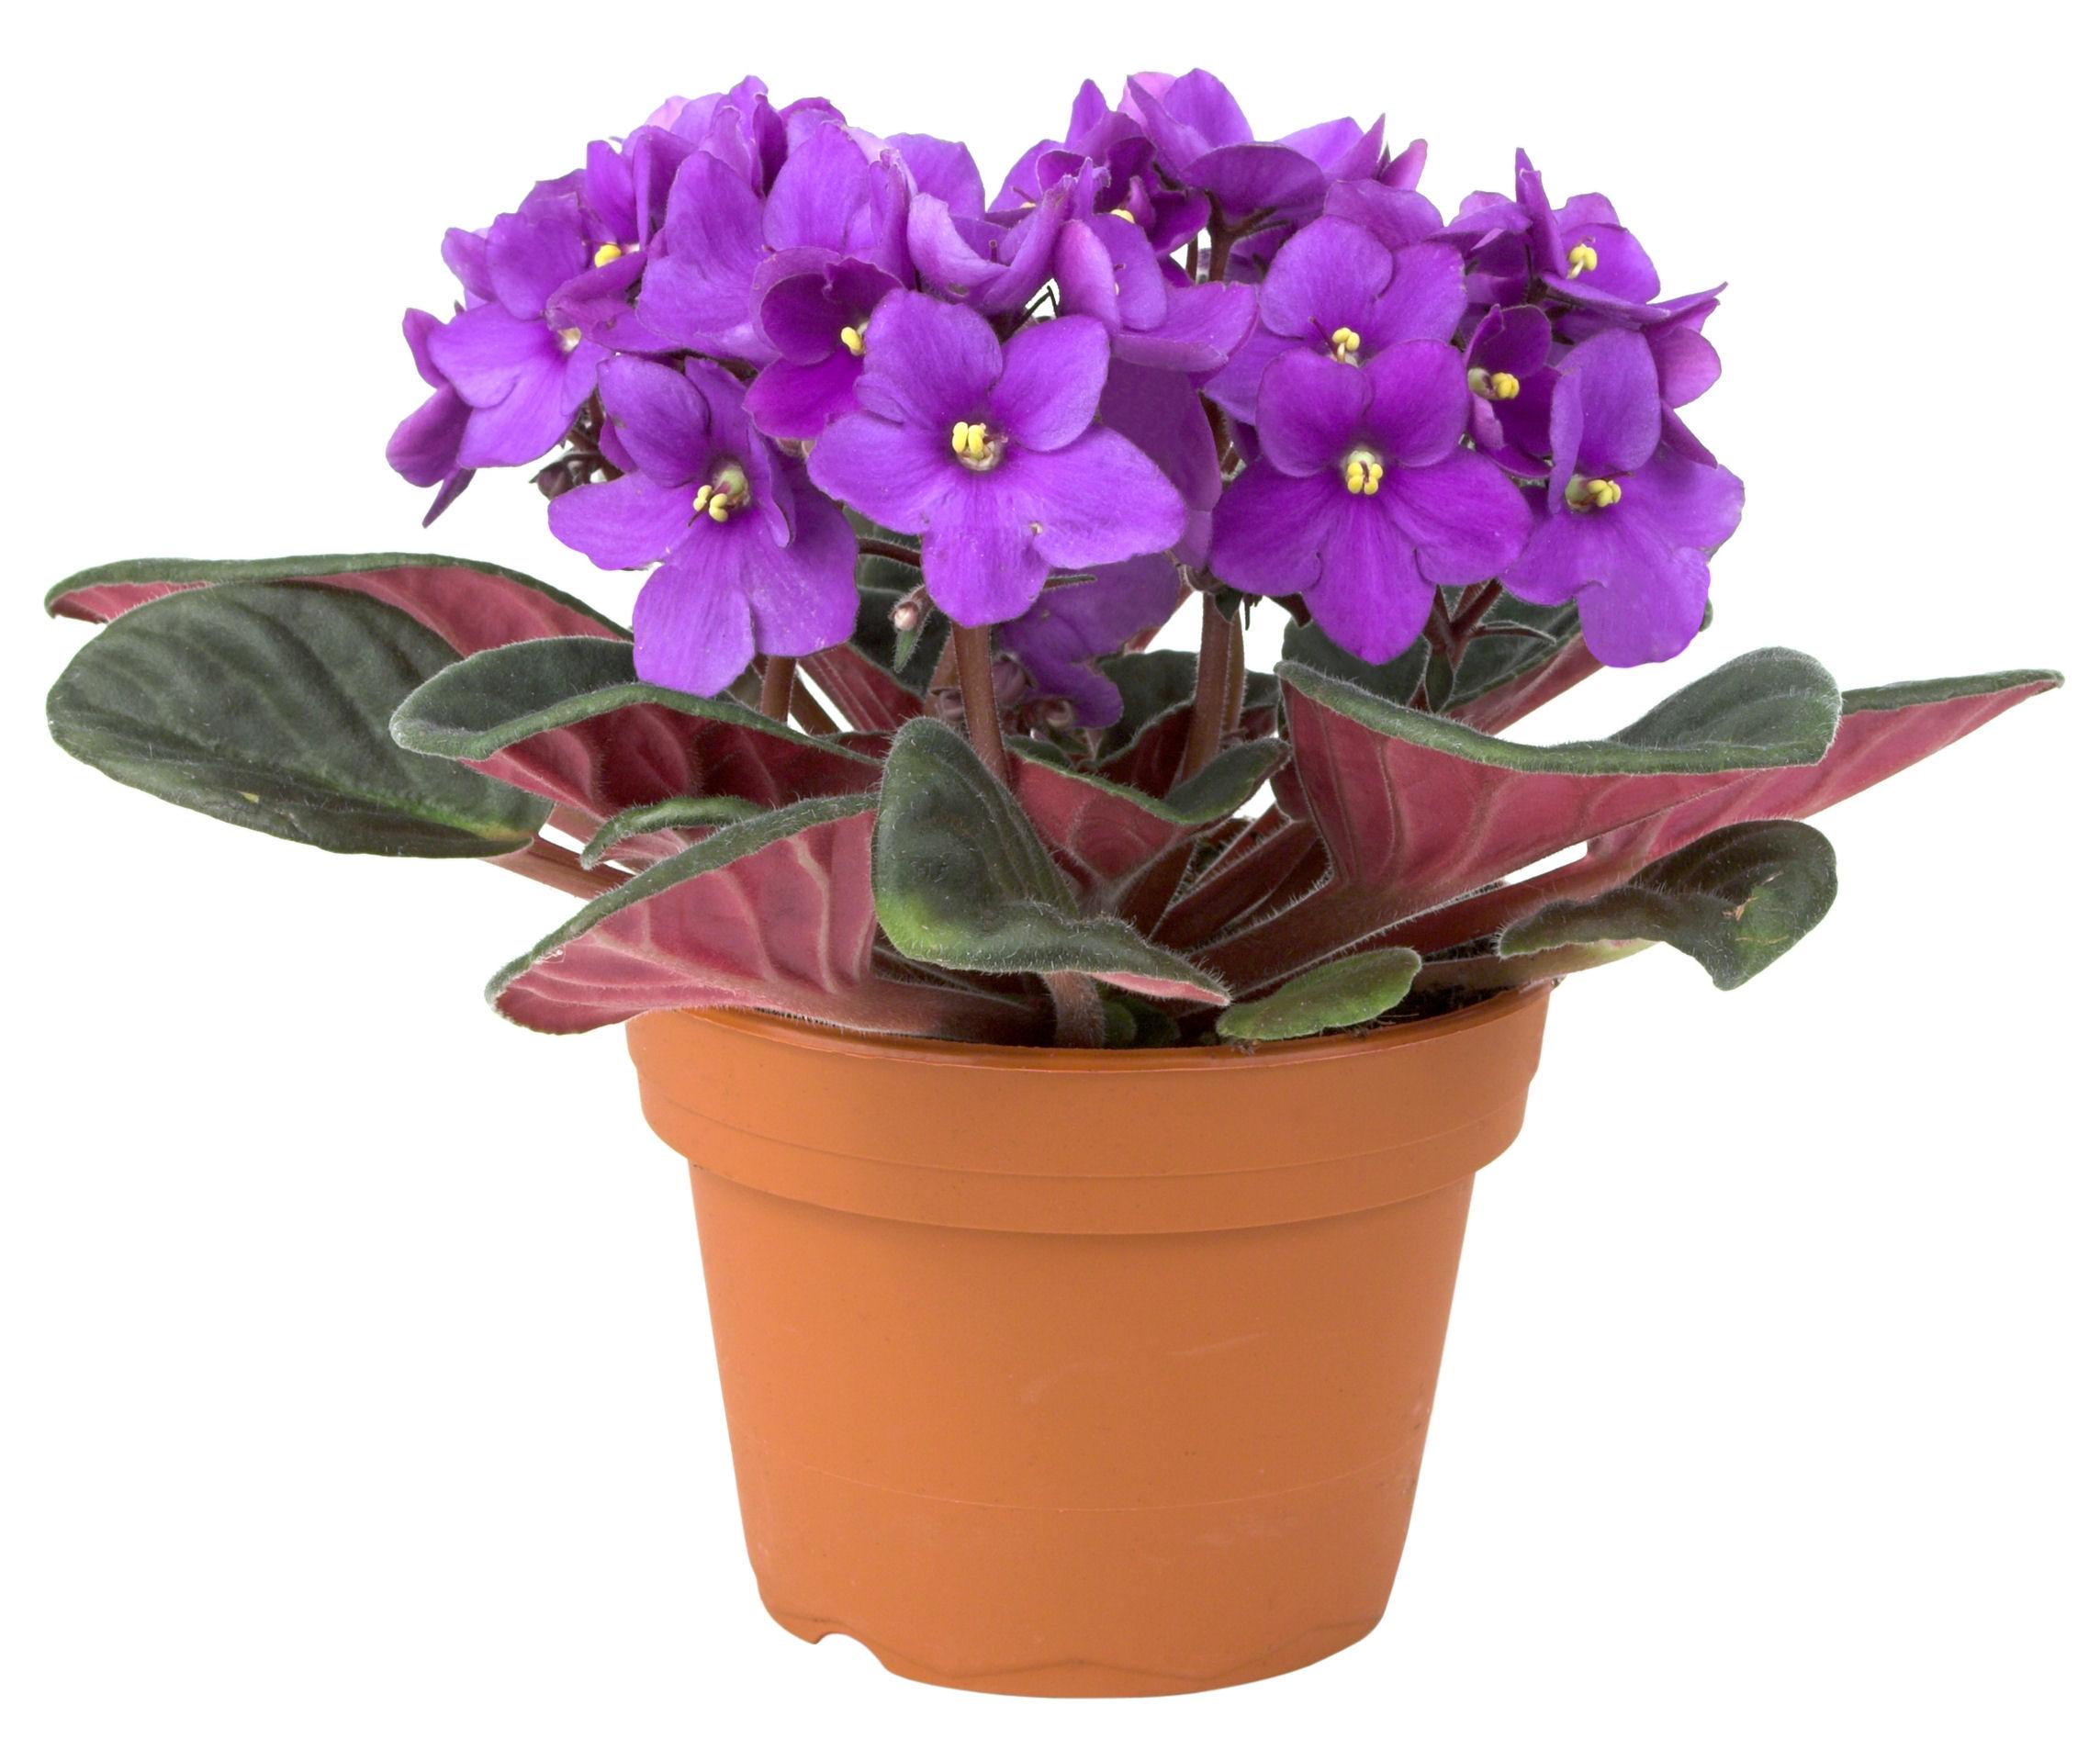 Fun flower facts african violet grower direct fresh cut flowers